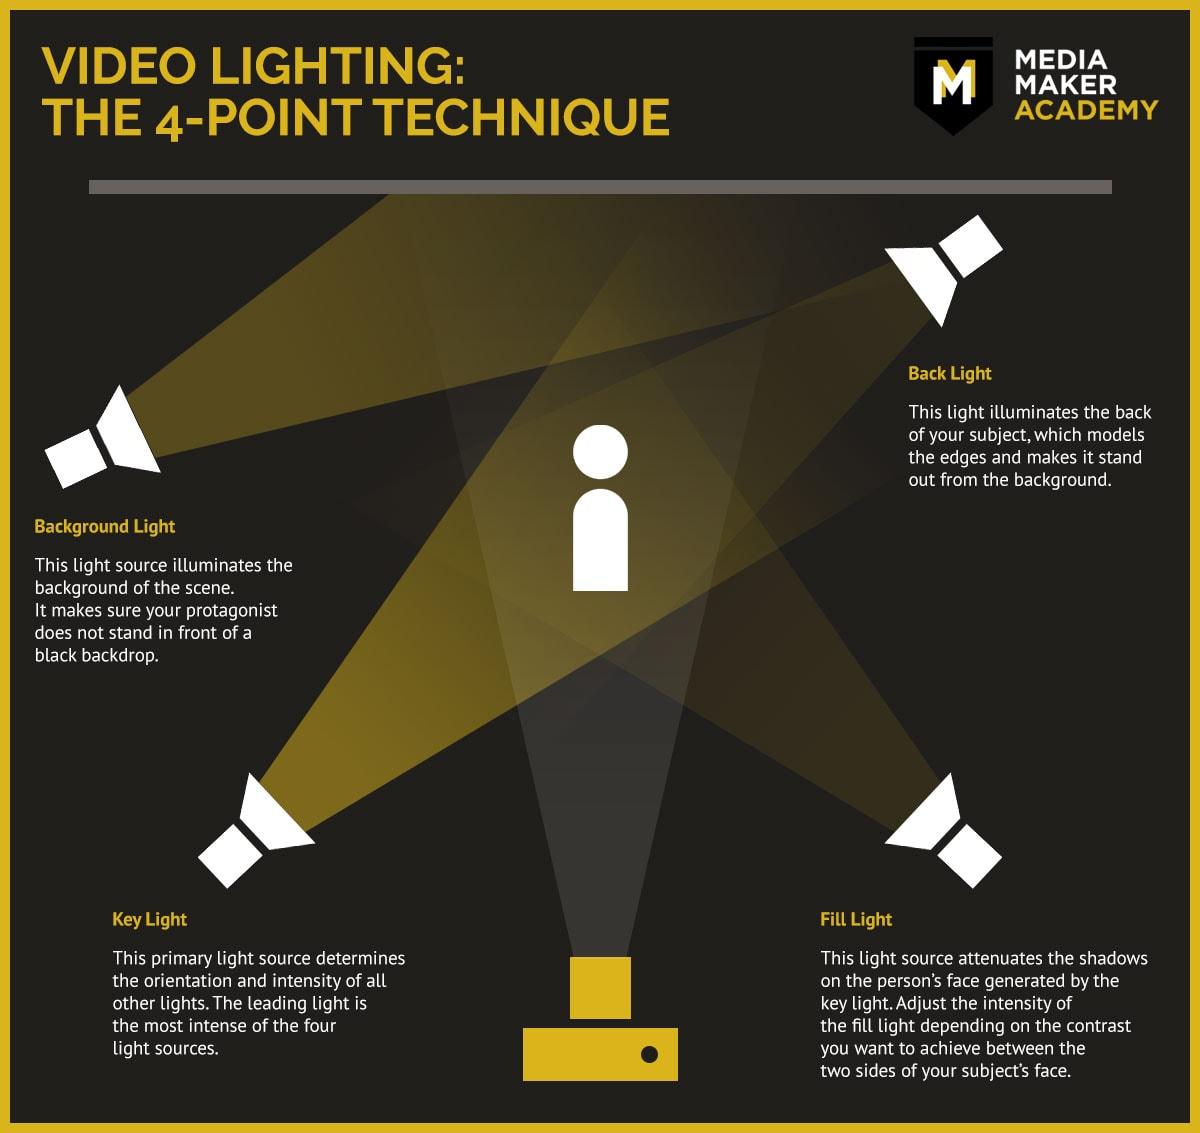 Video Lighting - 4-Point Technique